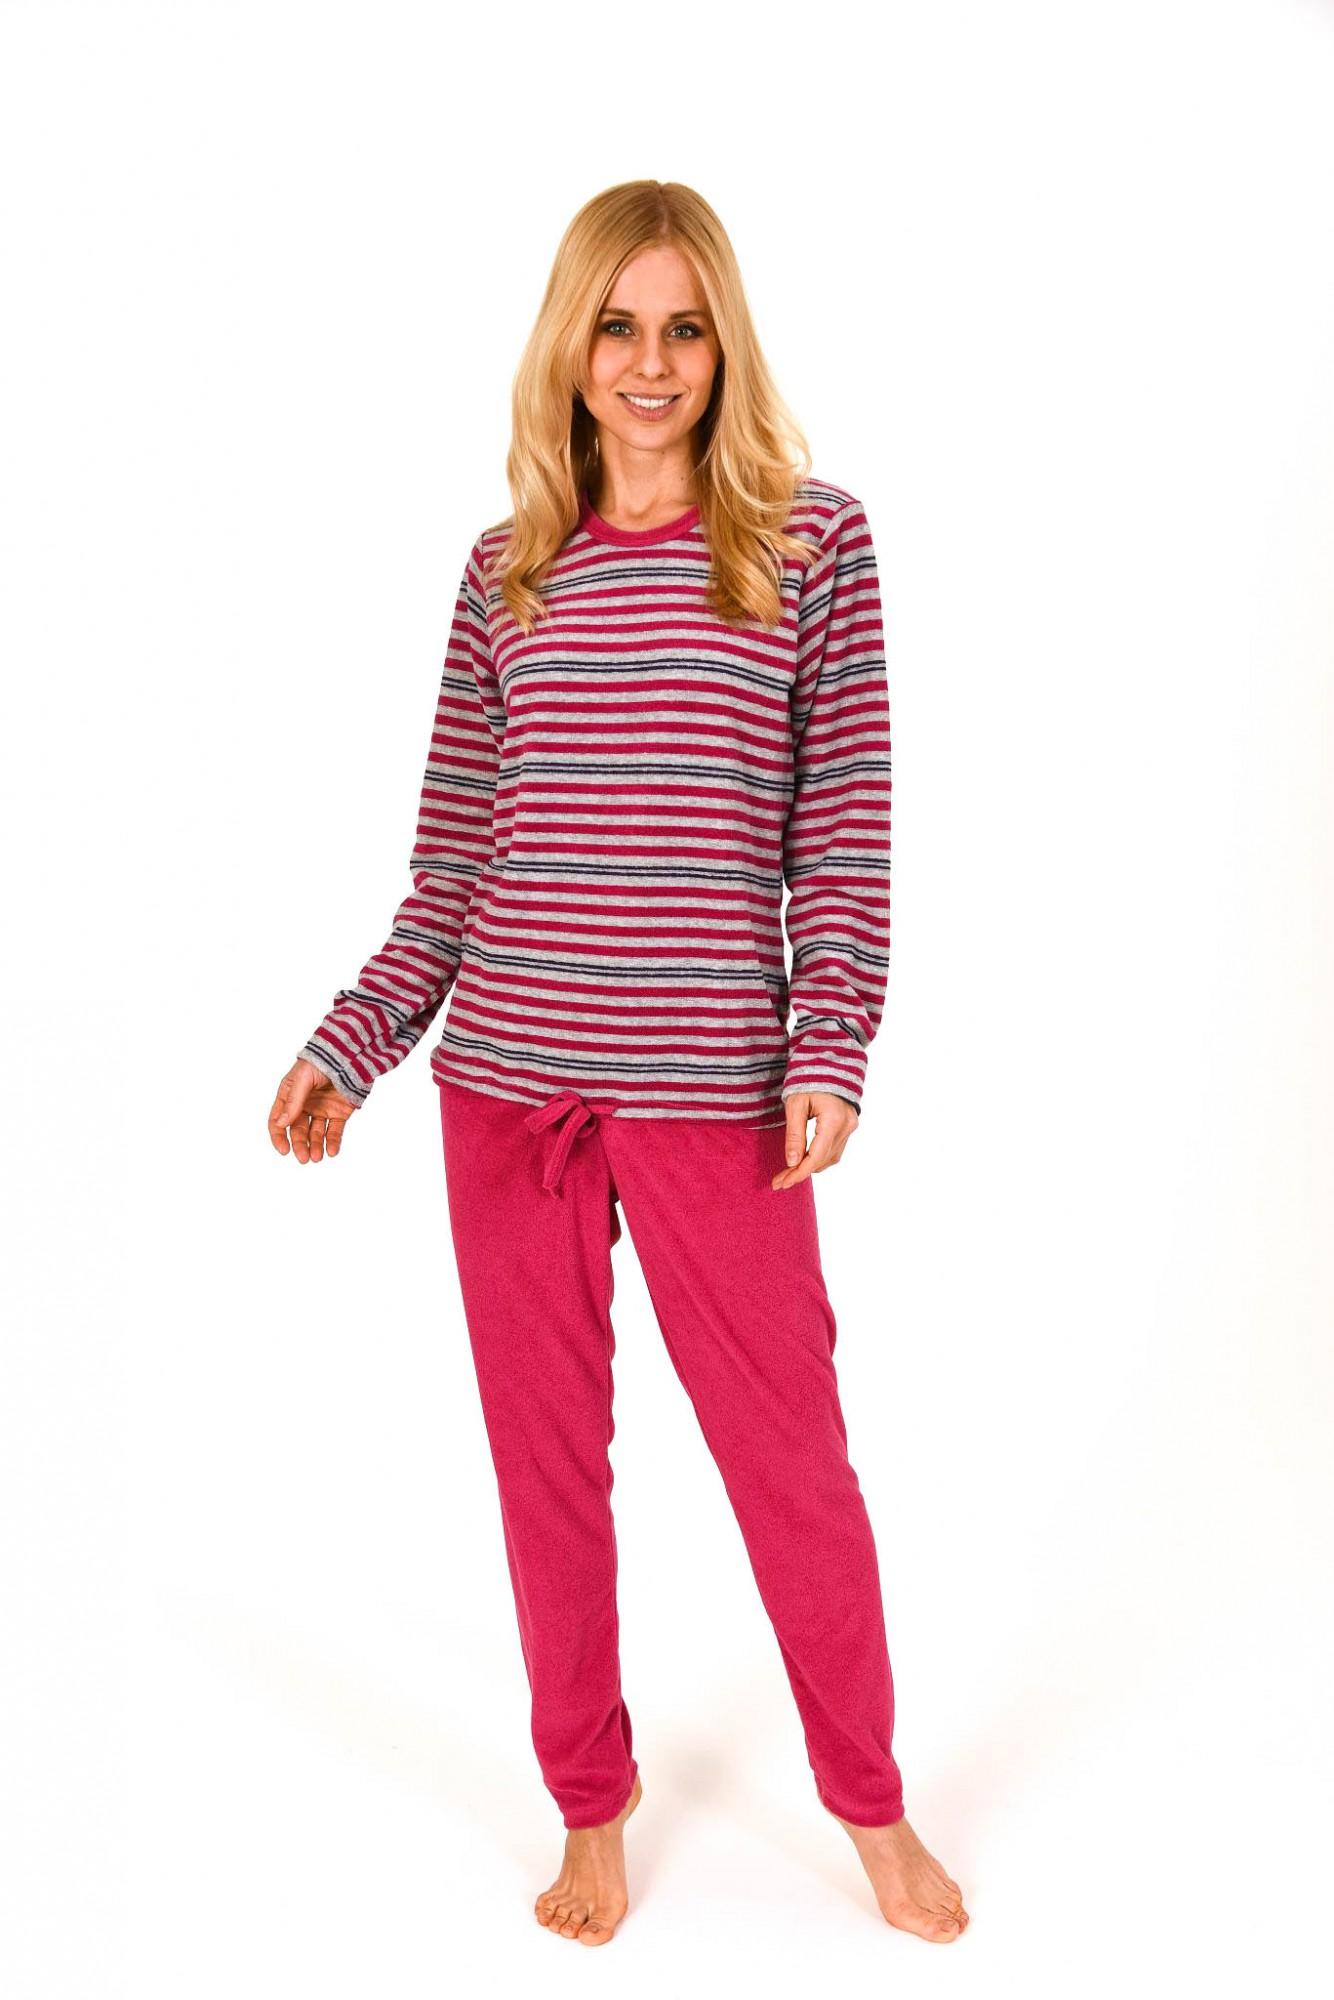 Damen Frottee Pyjama lang mit Bindeband – Streifendesign – 59497 – Bild 1